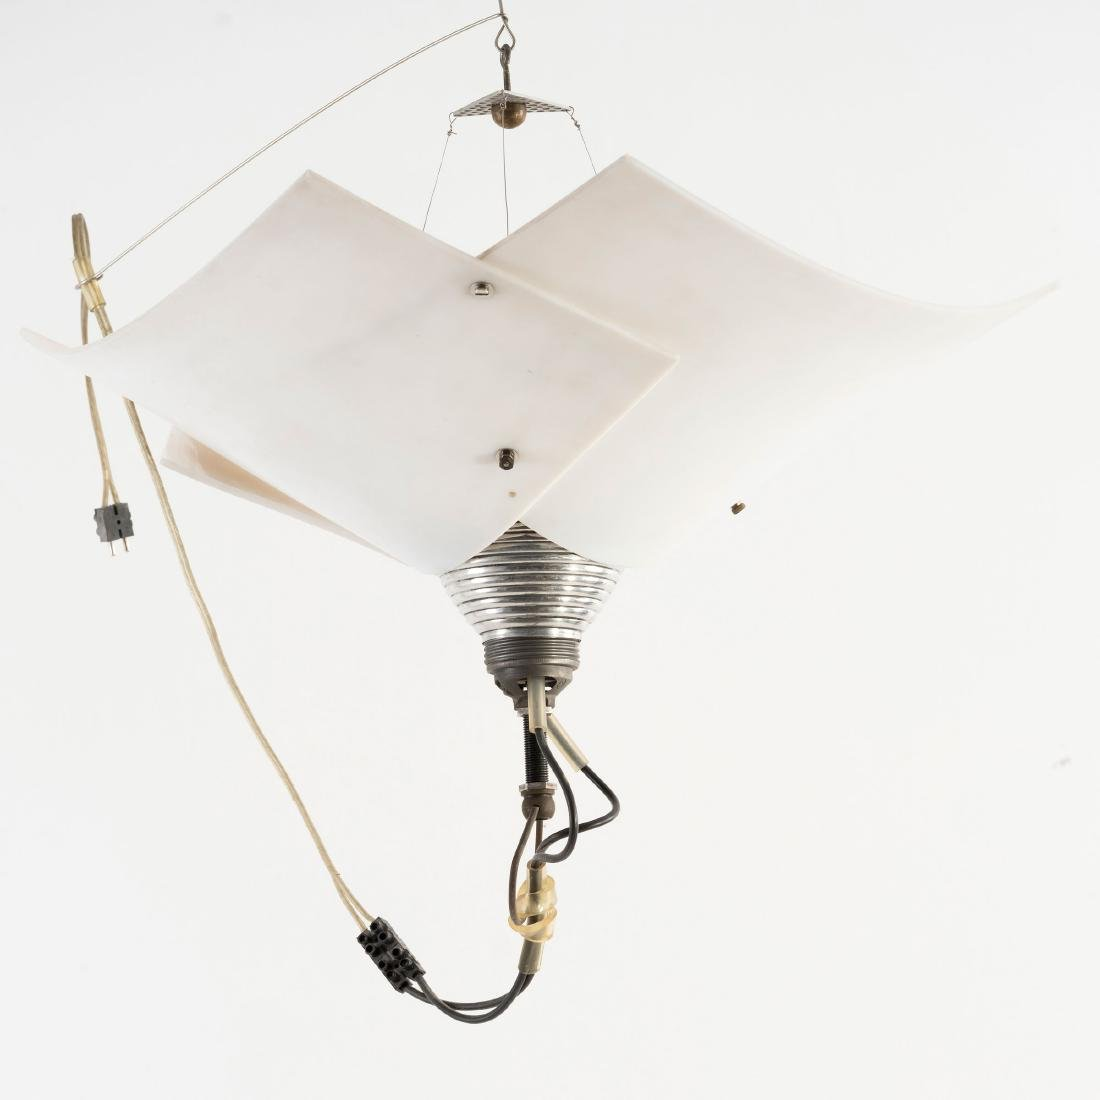 Ceiling light, c. 1984 - 2